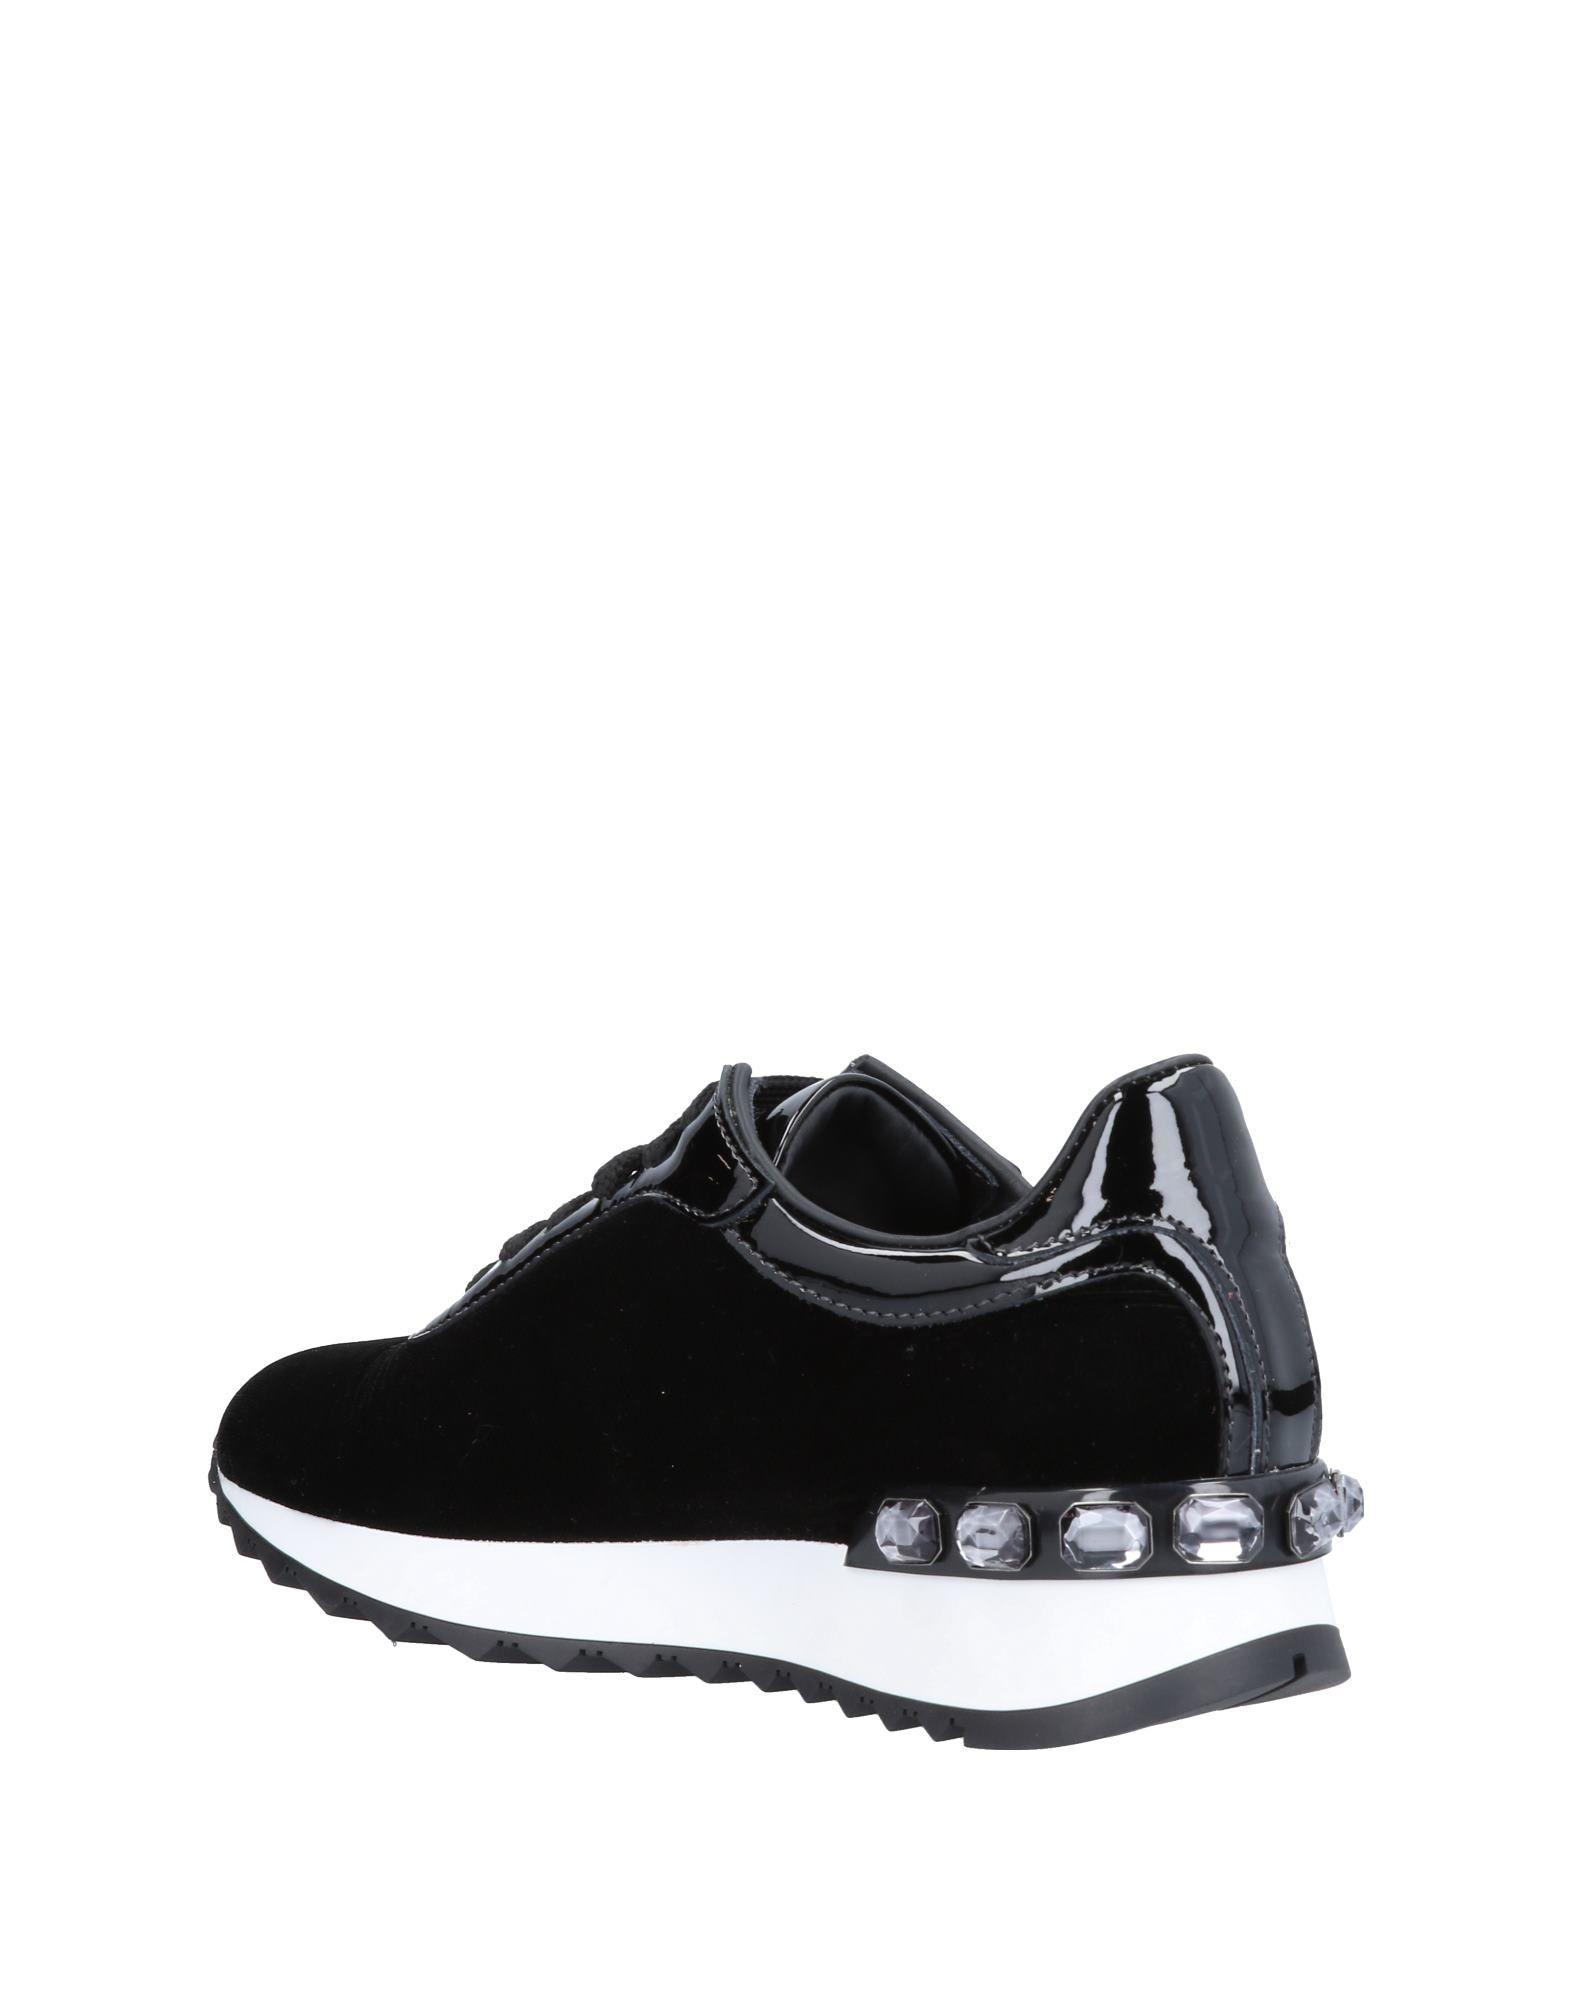 Rabatt Casadei Schuhe Casadei Rabatt Sneakers Damen  11500493IR 31ec7d